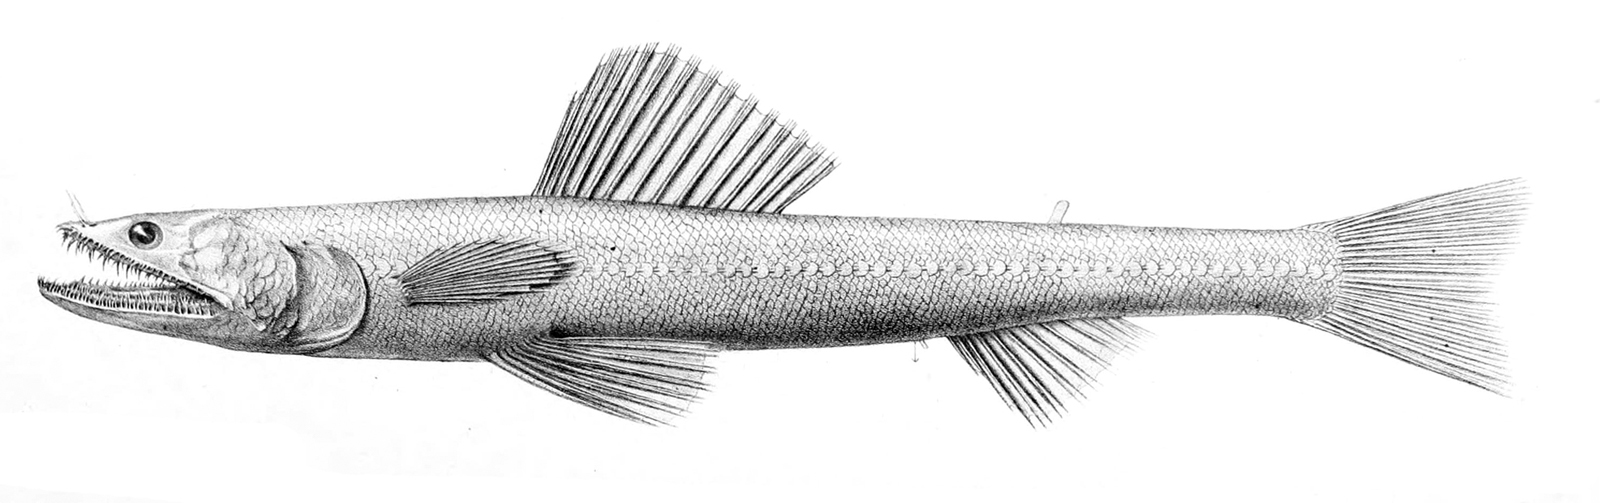 Image of Highfin Lizardfish